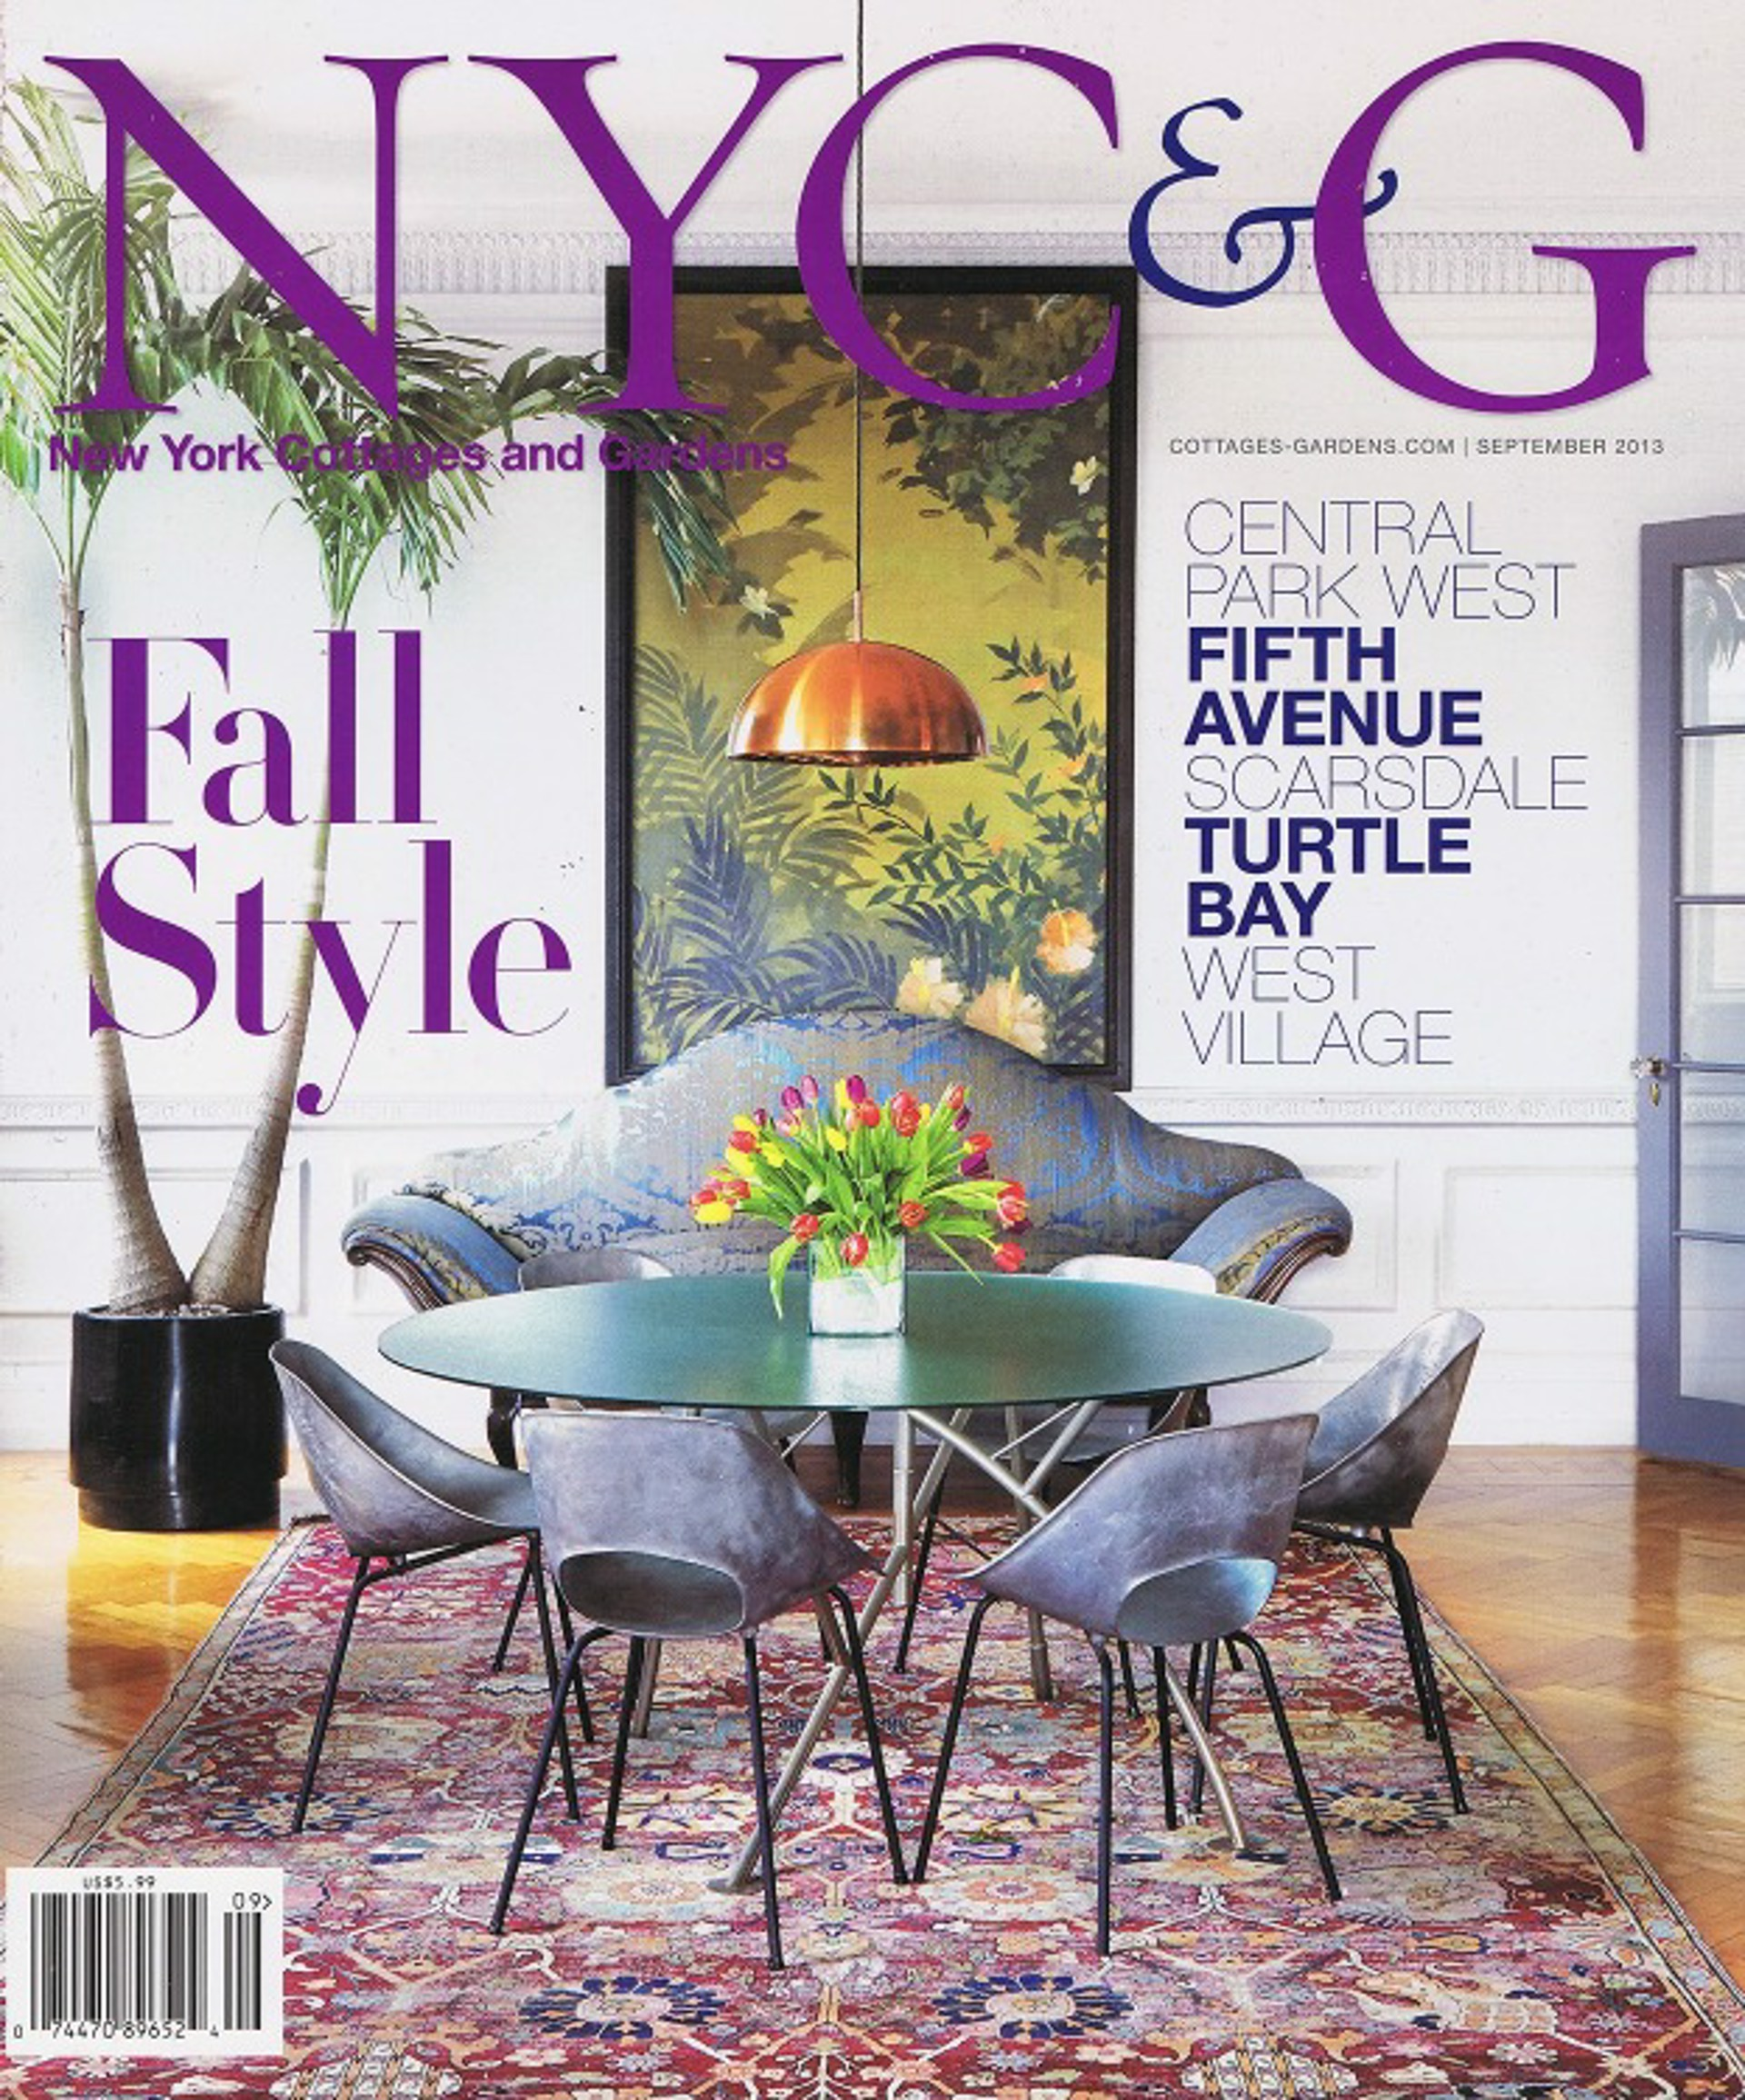 NYC&G, September 2013 - Jacques Jarrige